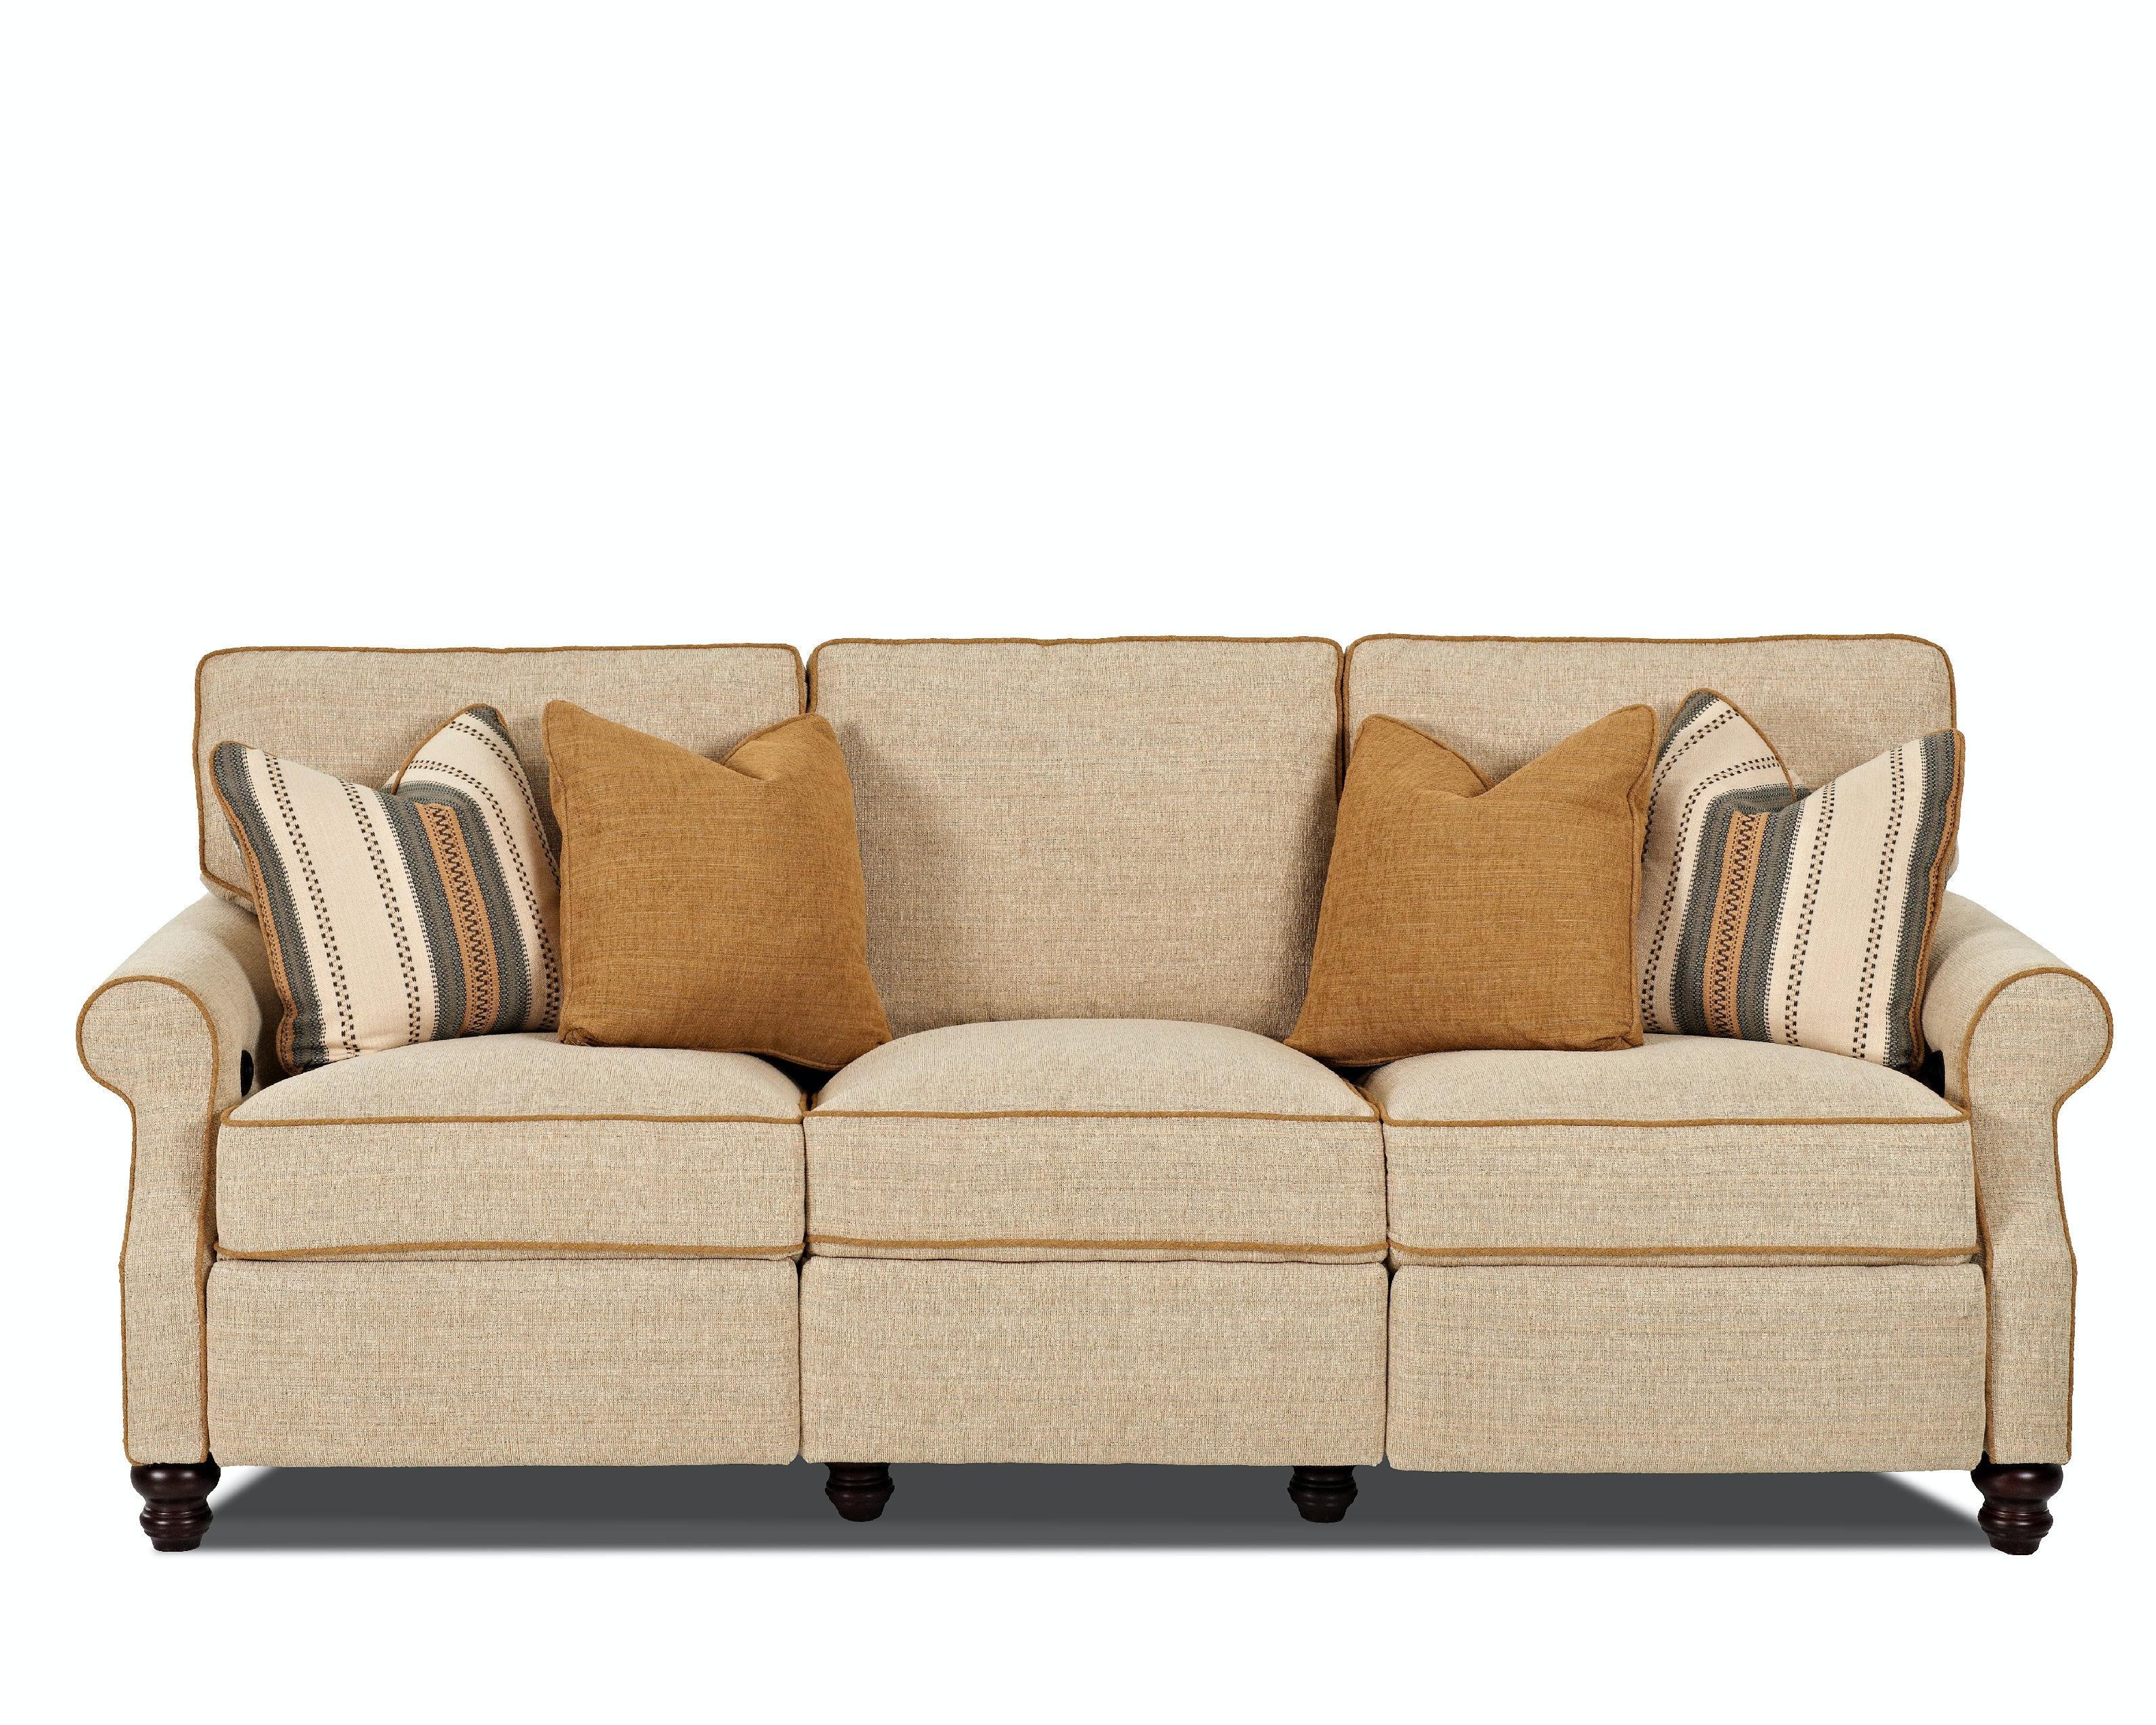 Trisha Yearwood Tifton Sofa D26003 PWRS